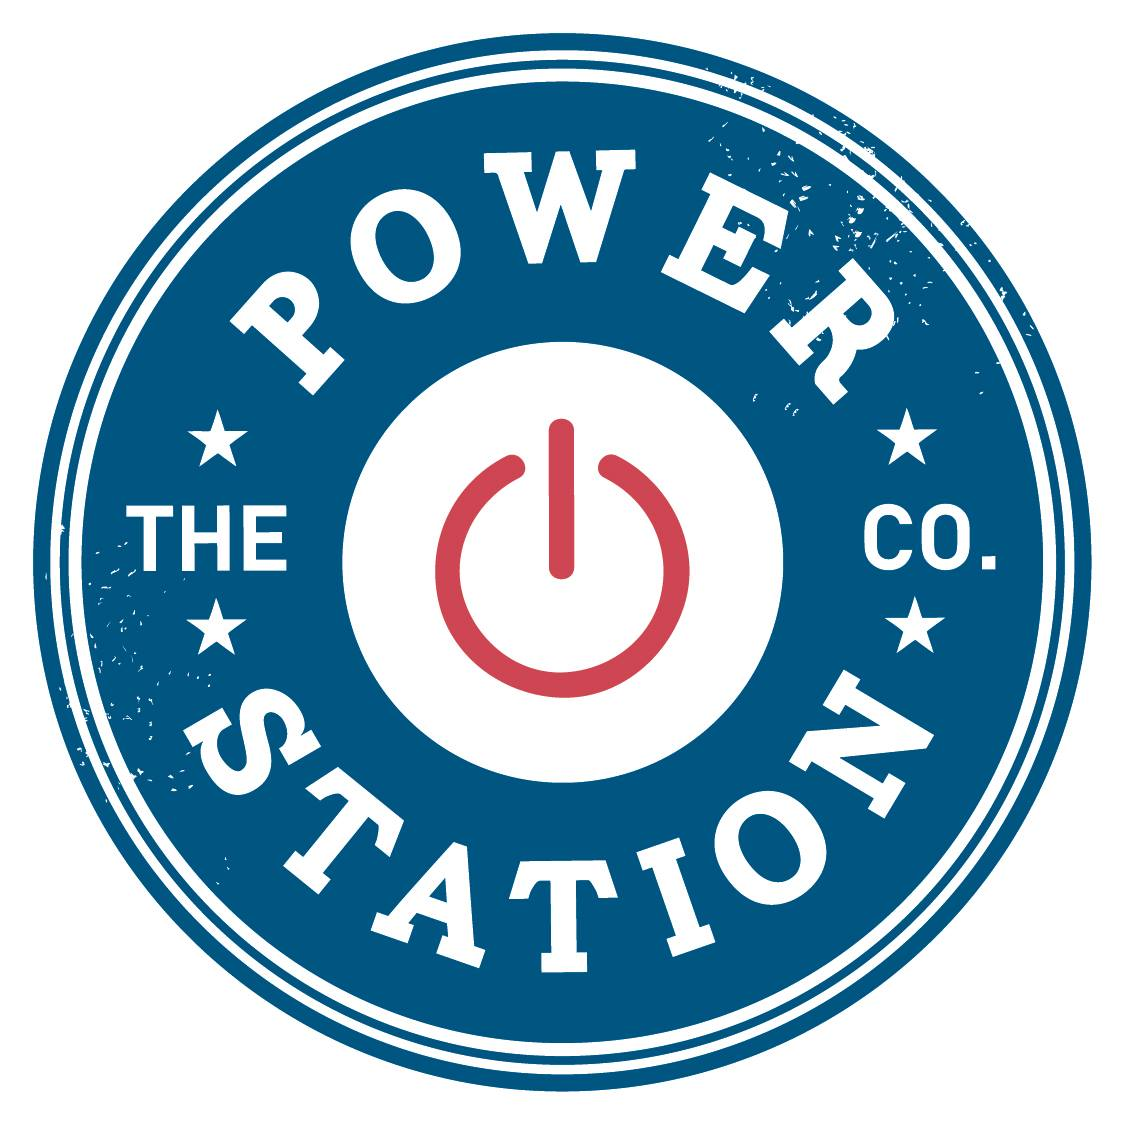 POWER STATION LOGO.jpg